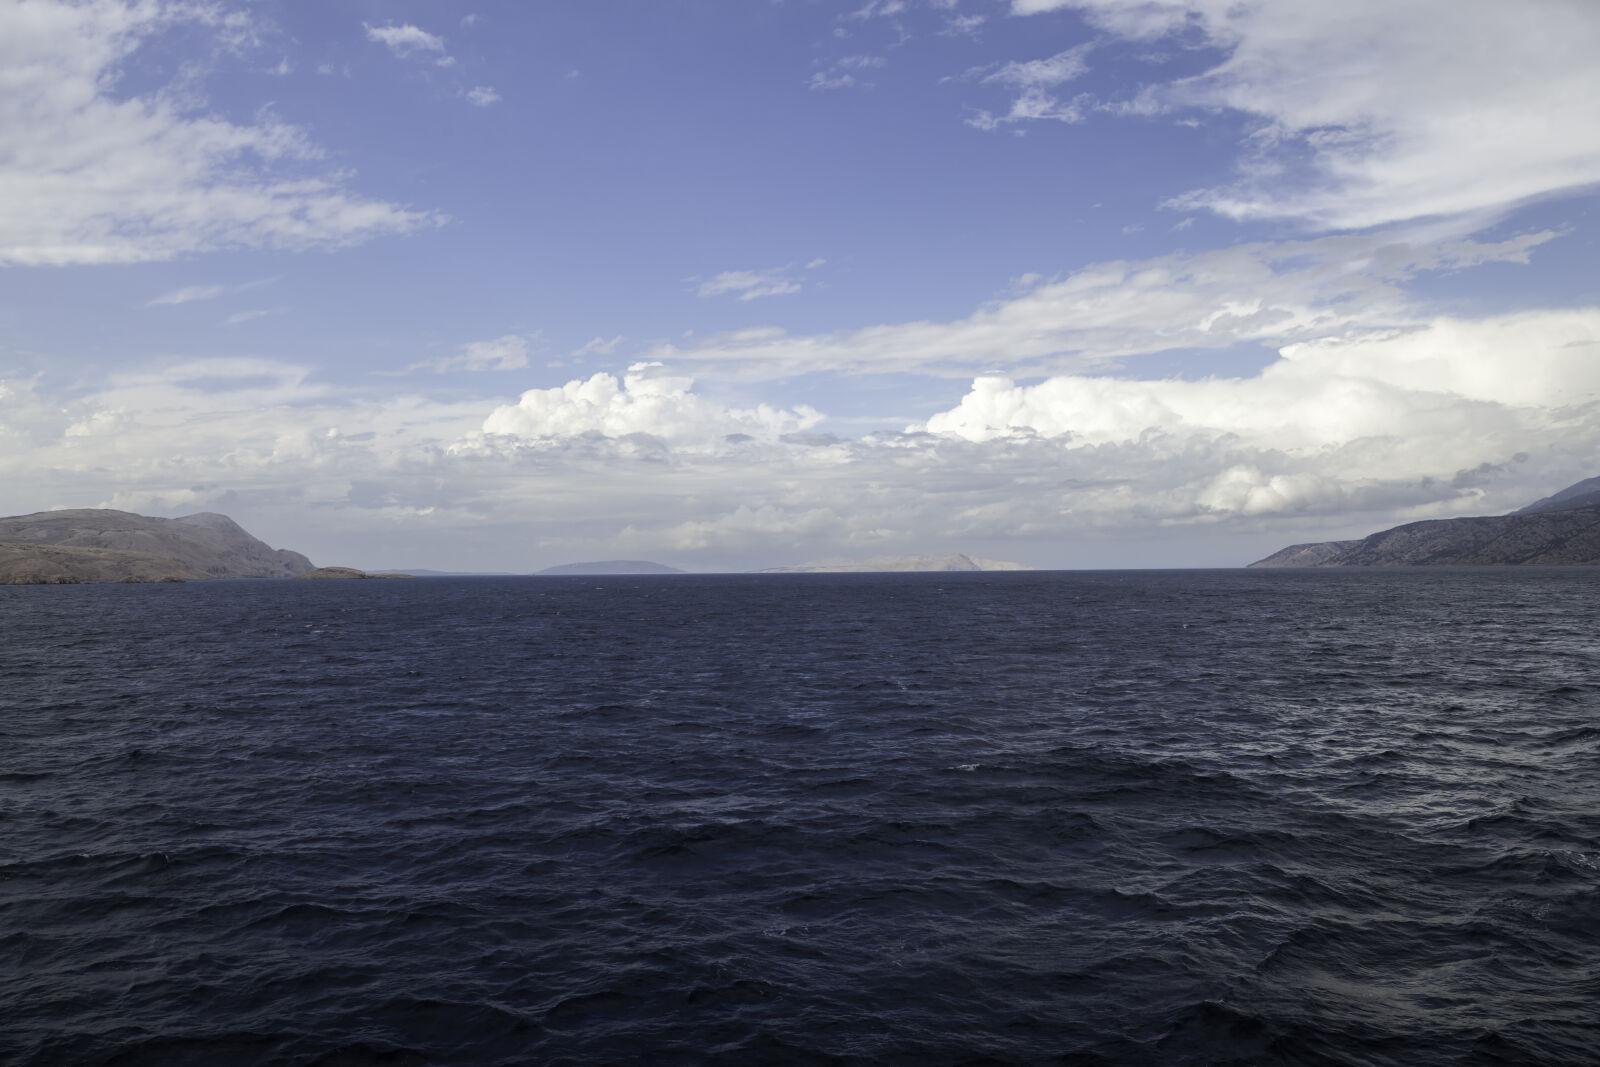 sea, of, clouds, sea